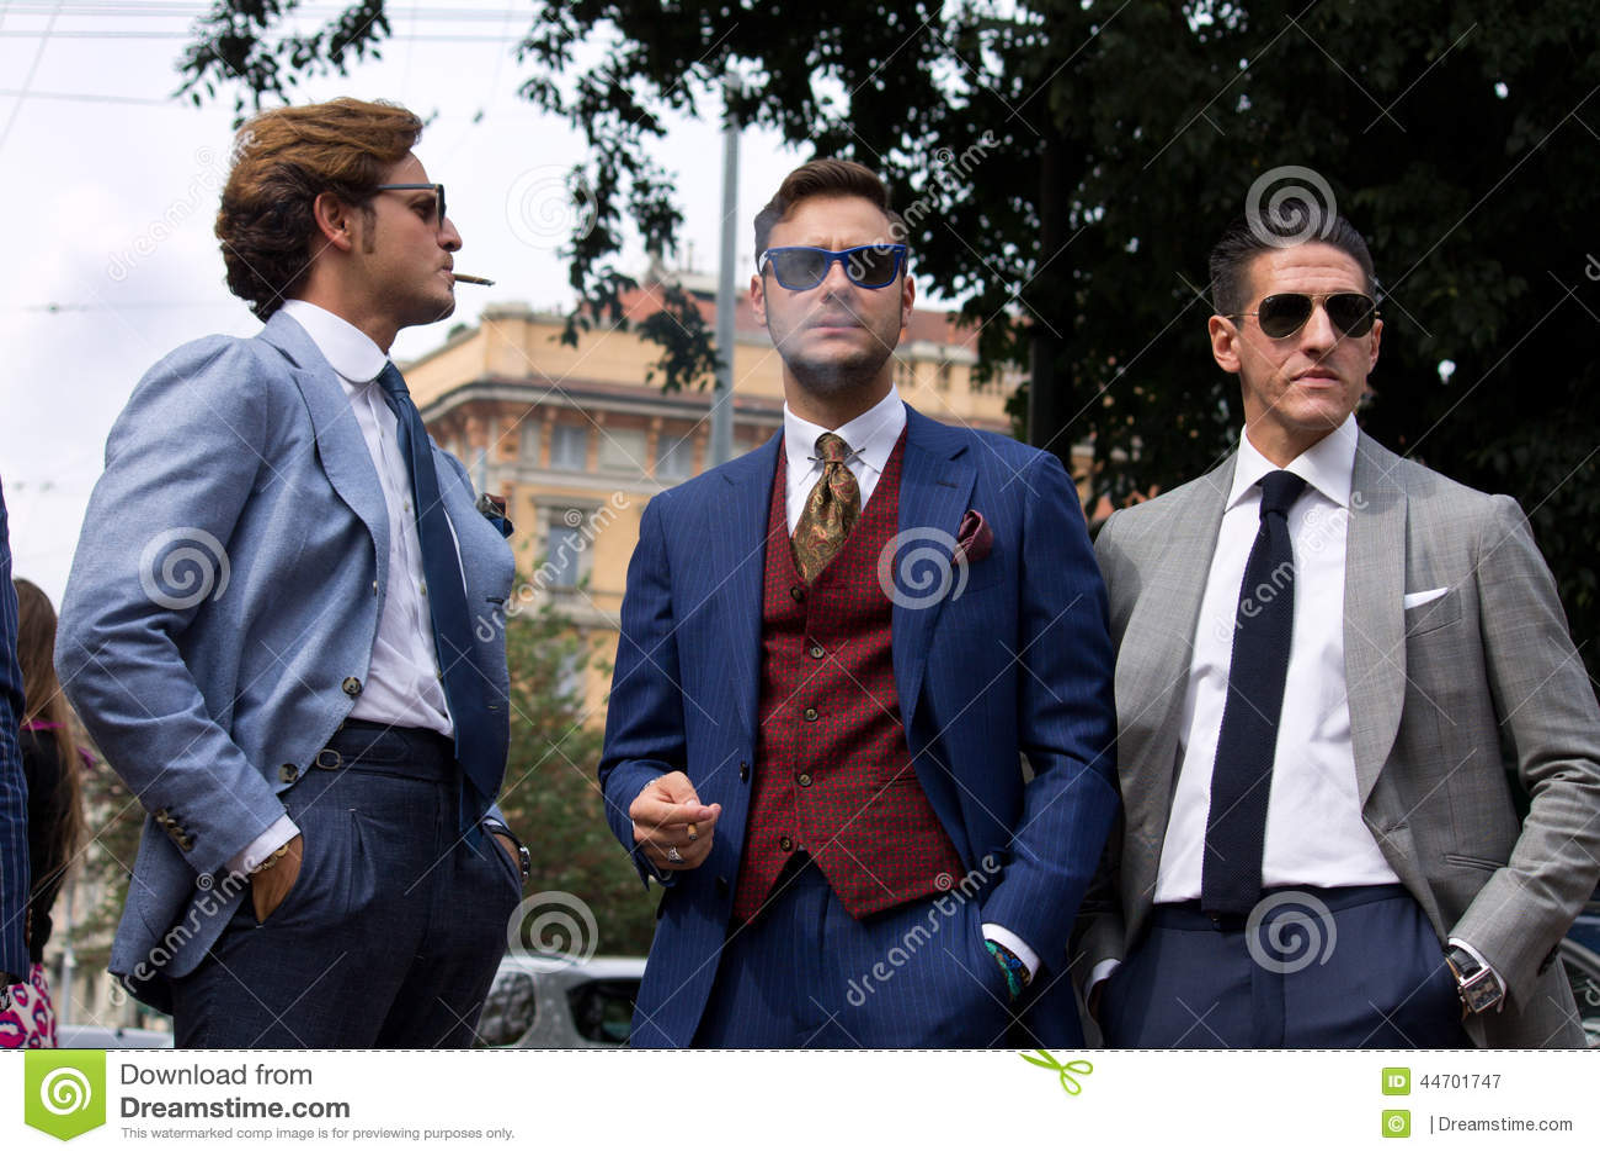 Street style during milan fashion week for spring summer 2015 editorial photography image Fashion week 2015 men s hairstyle